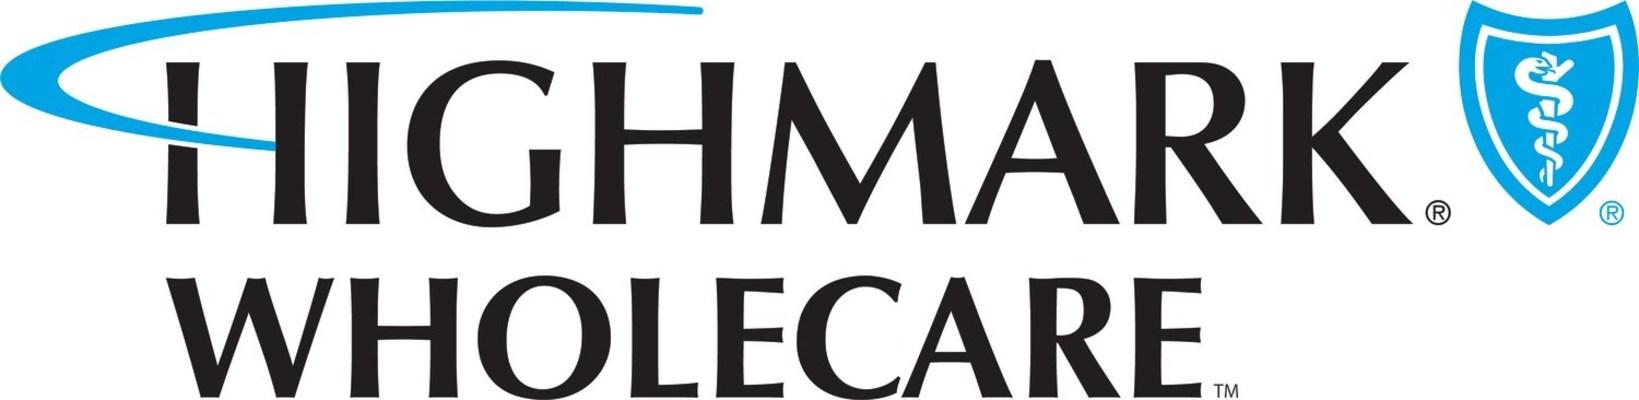 Highmark Wholecare